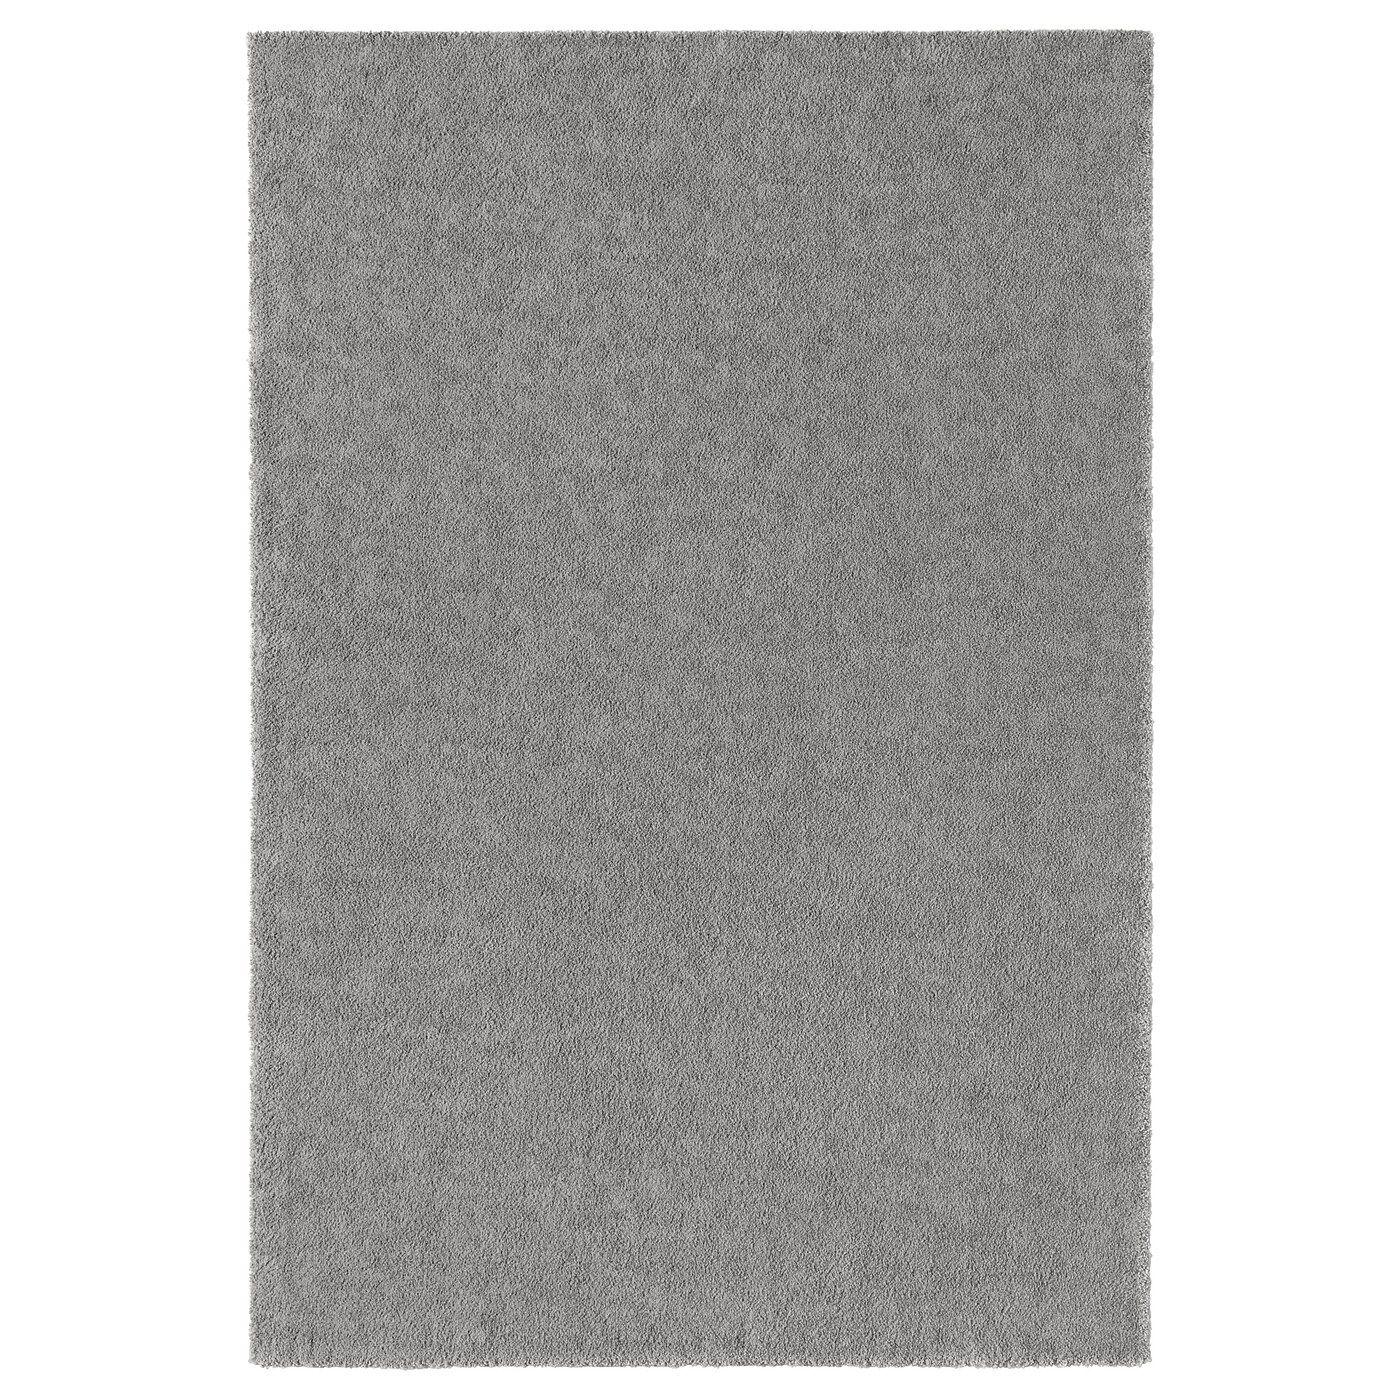 Stoense Vloerkleed Laagpolig Middengrijs 200x300 Cm Ikea Ikea Teppich Teppich Reinigen Teppich